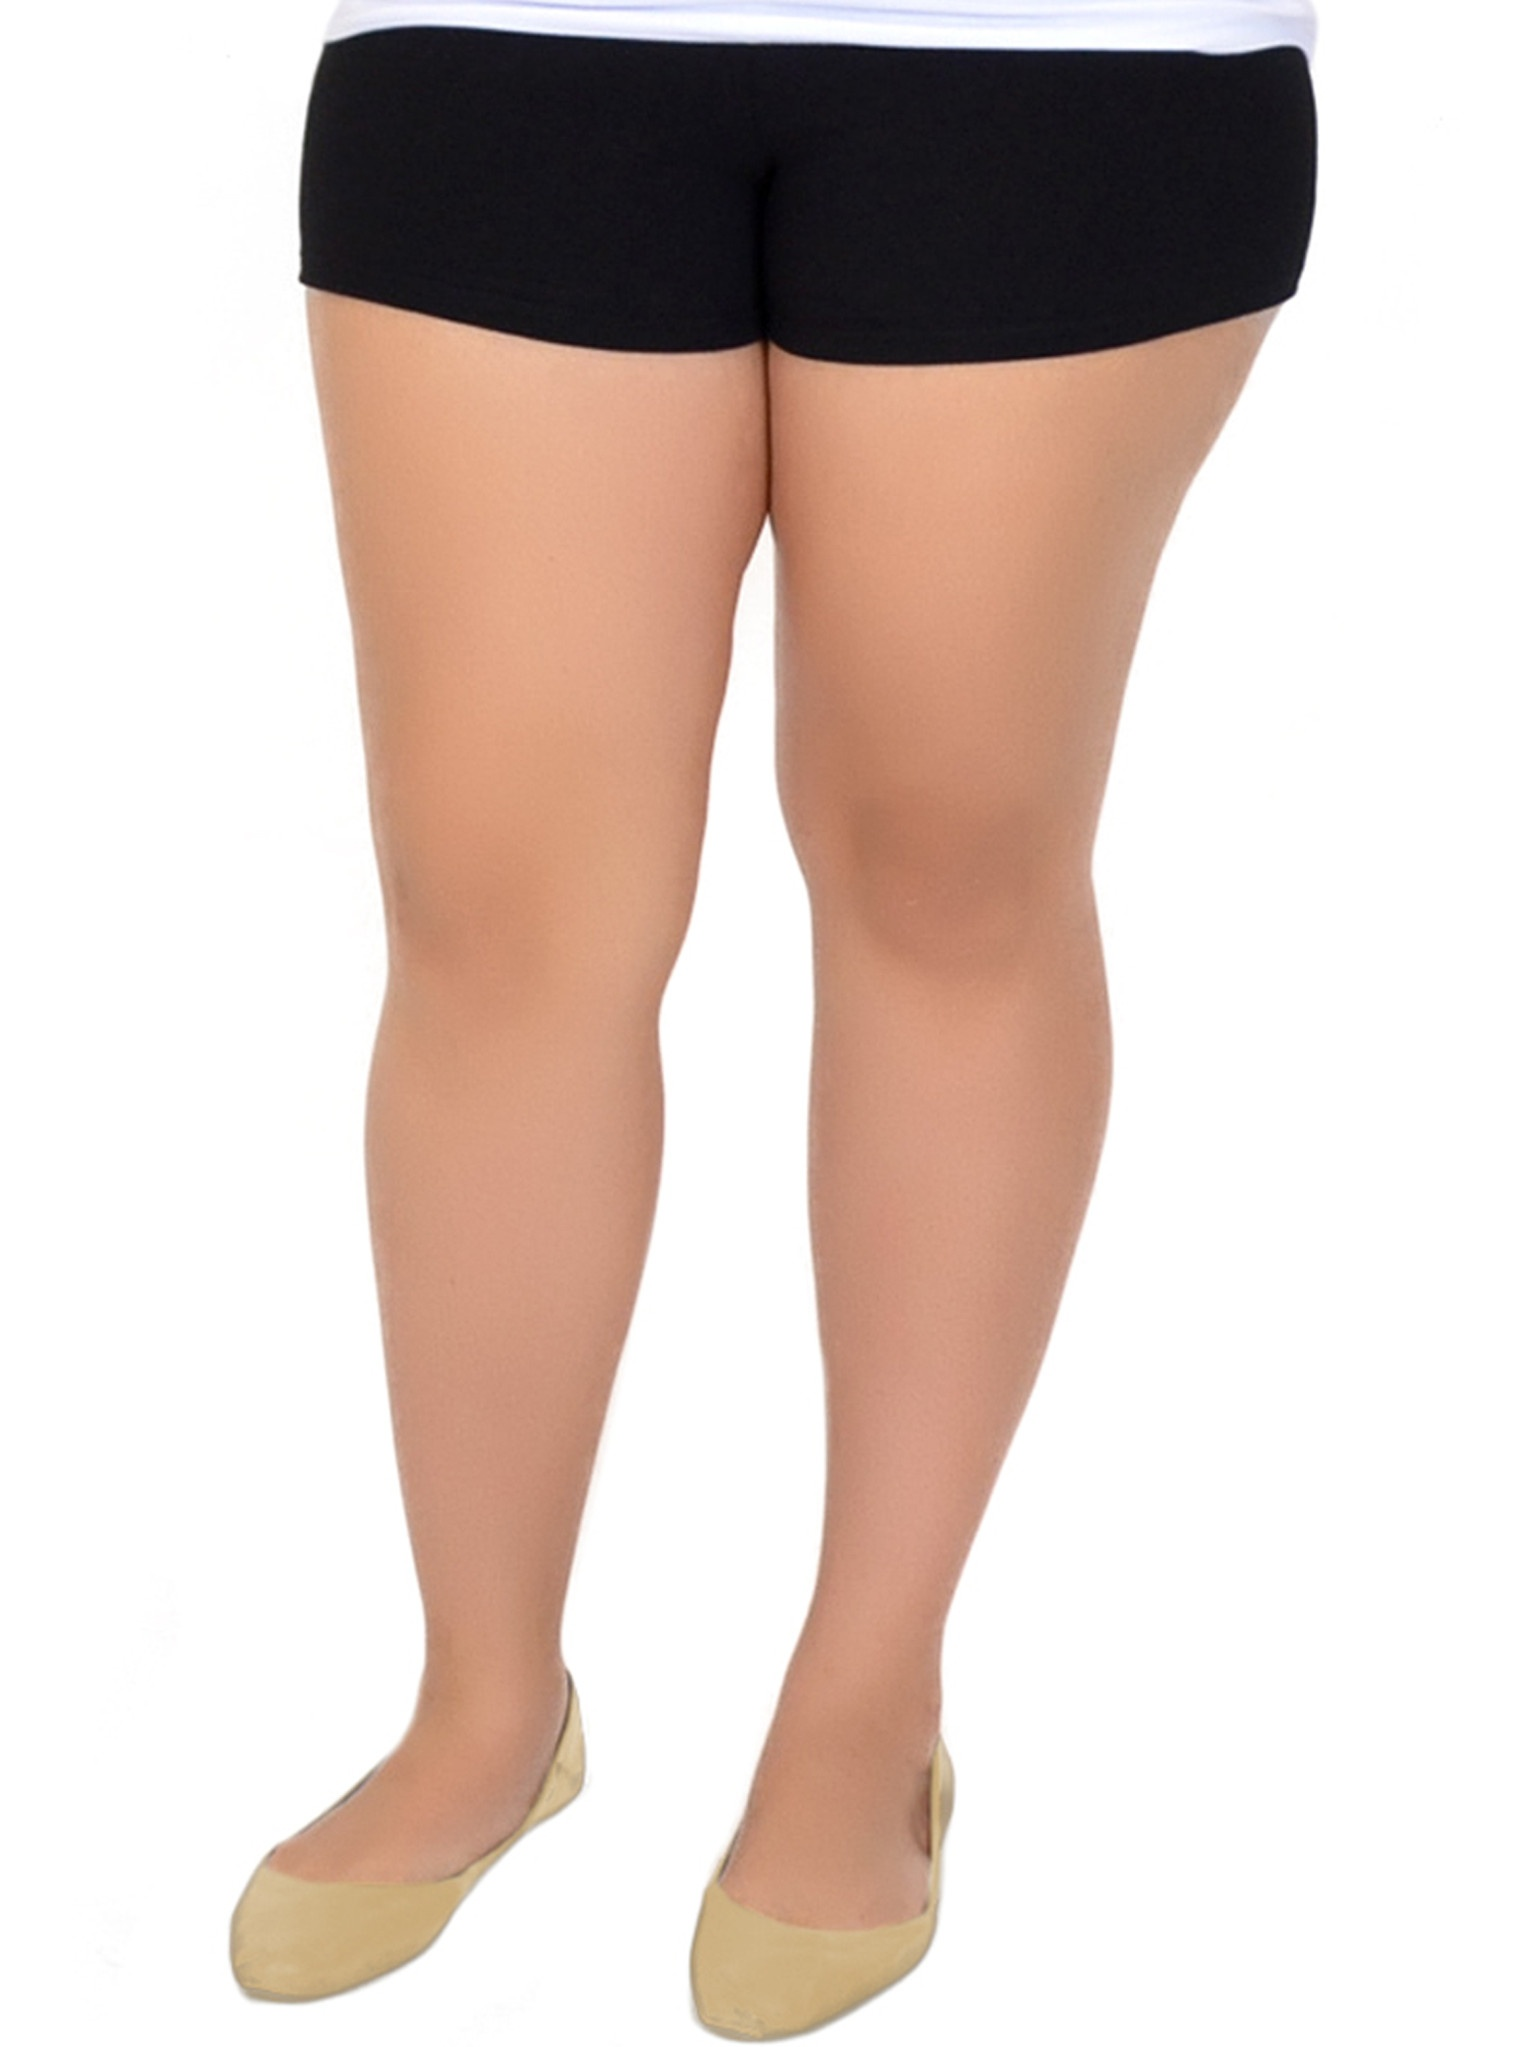 Girls In Booty Panties Pics